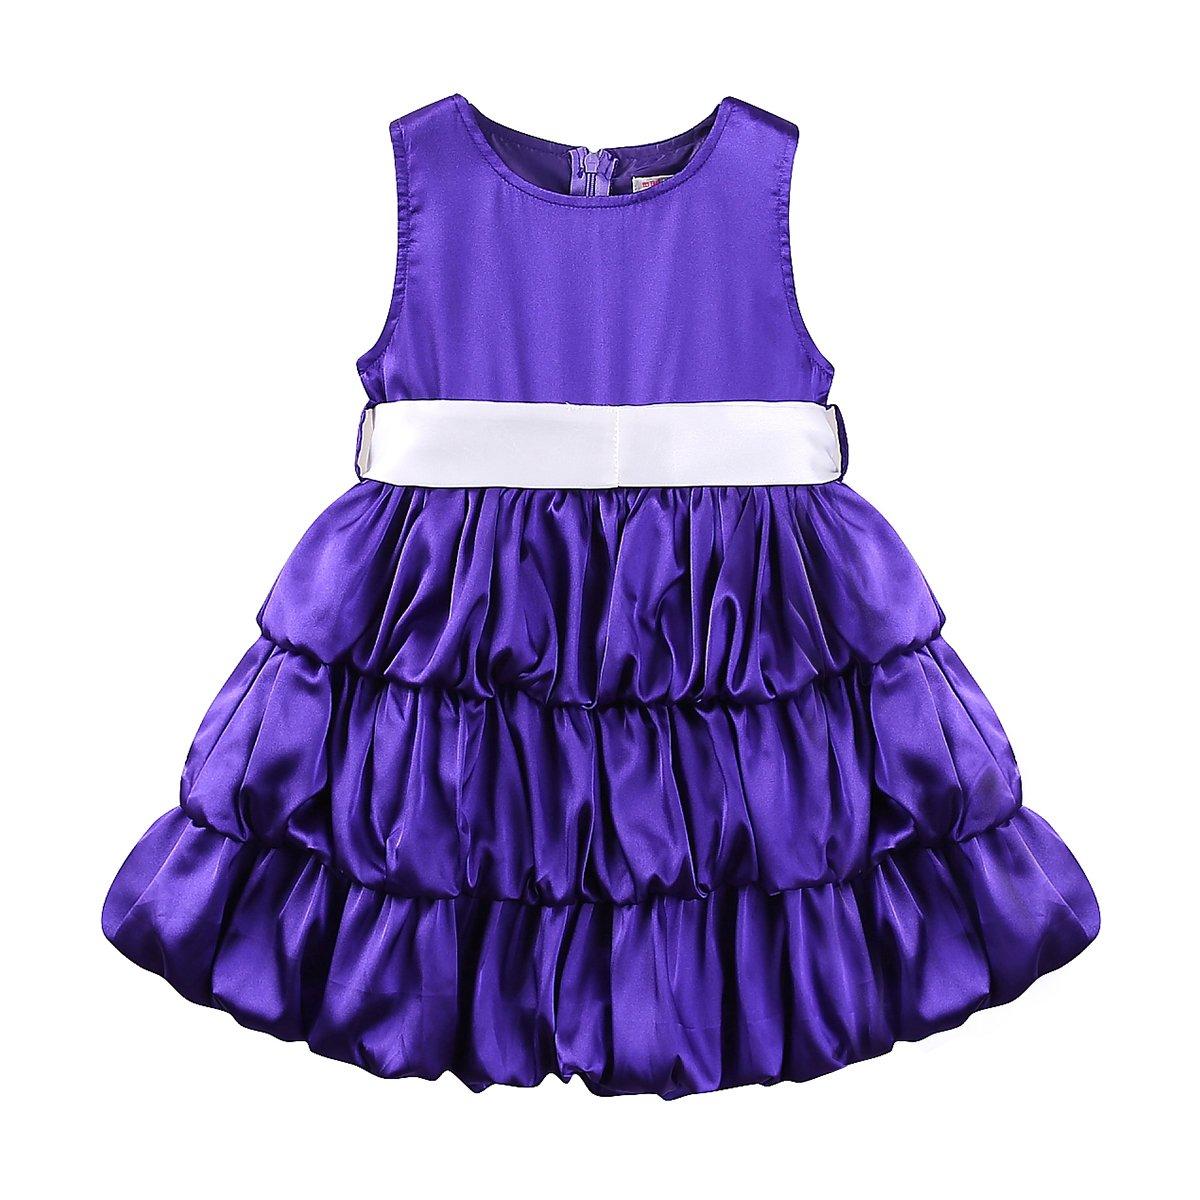 Mud Kingdom Little Girls Party Dresses Elegant Princess Purple